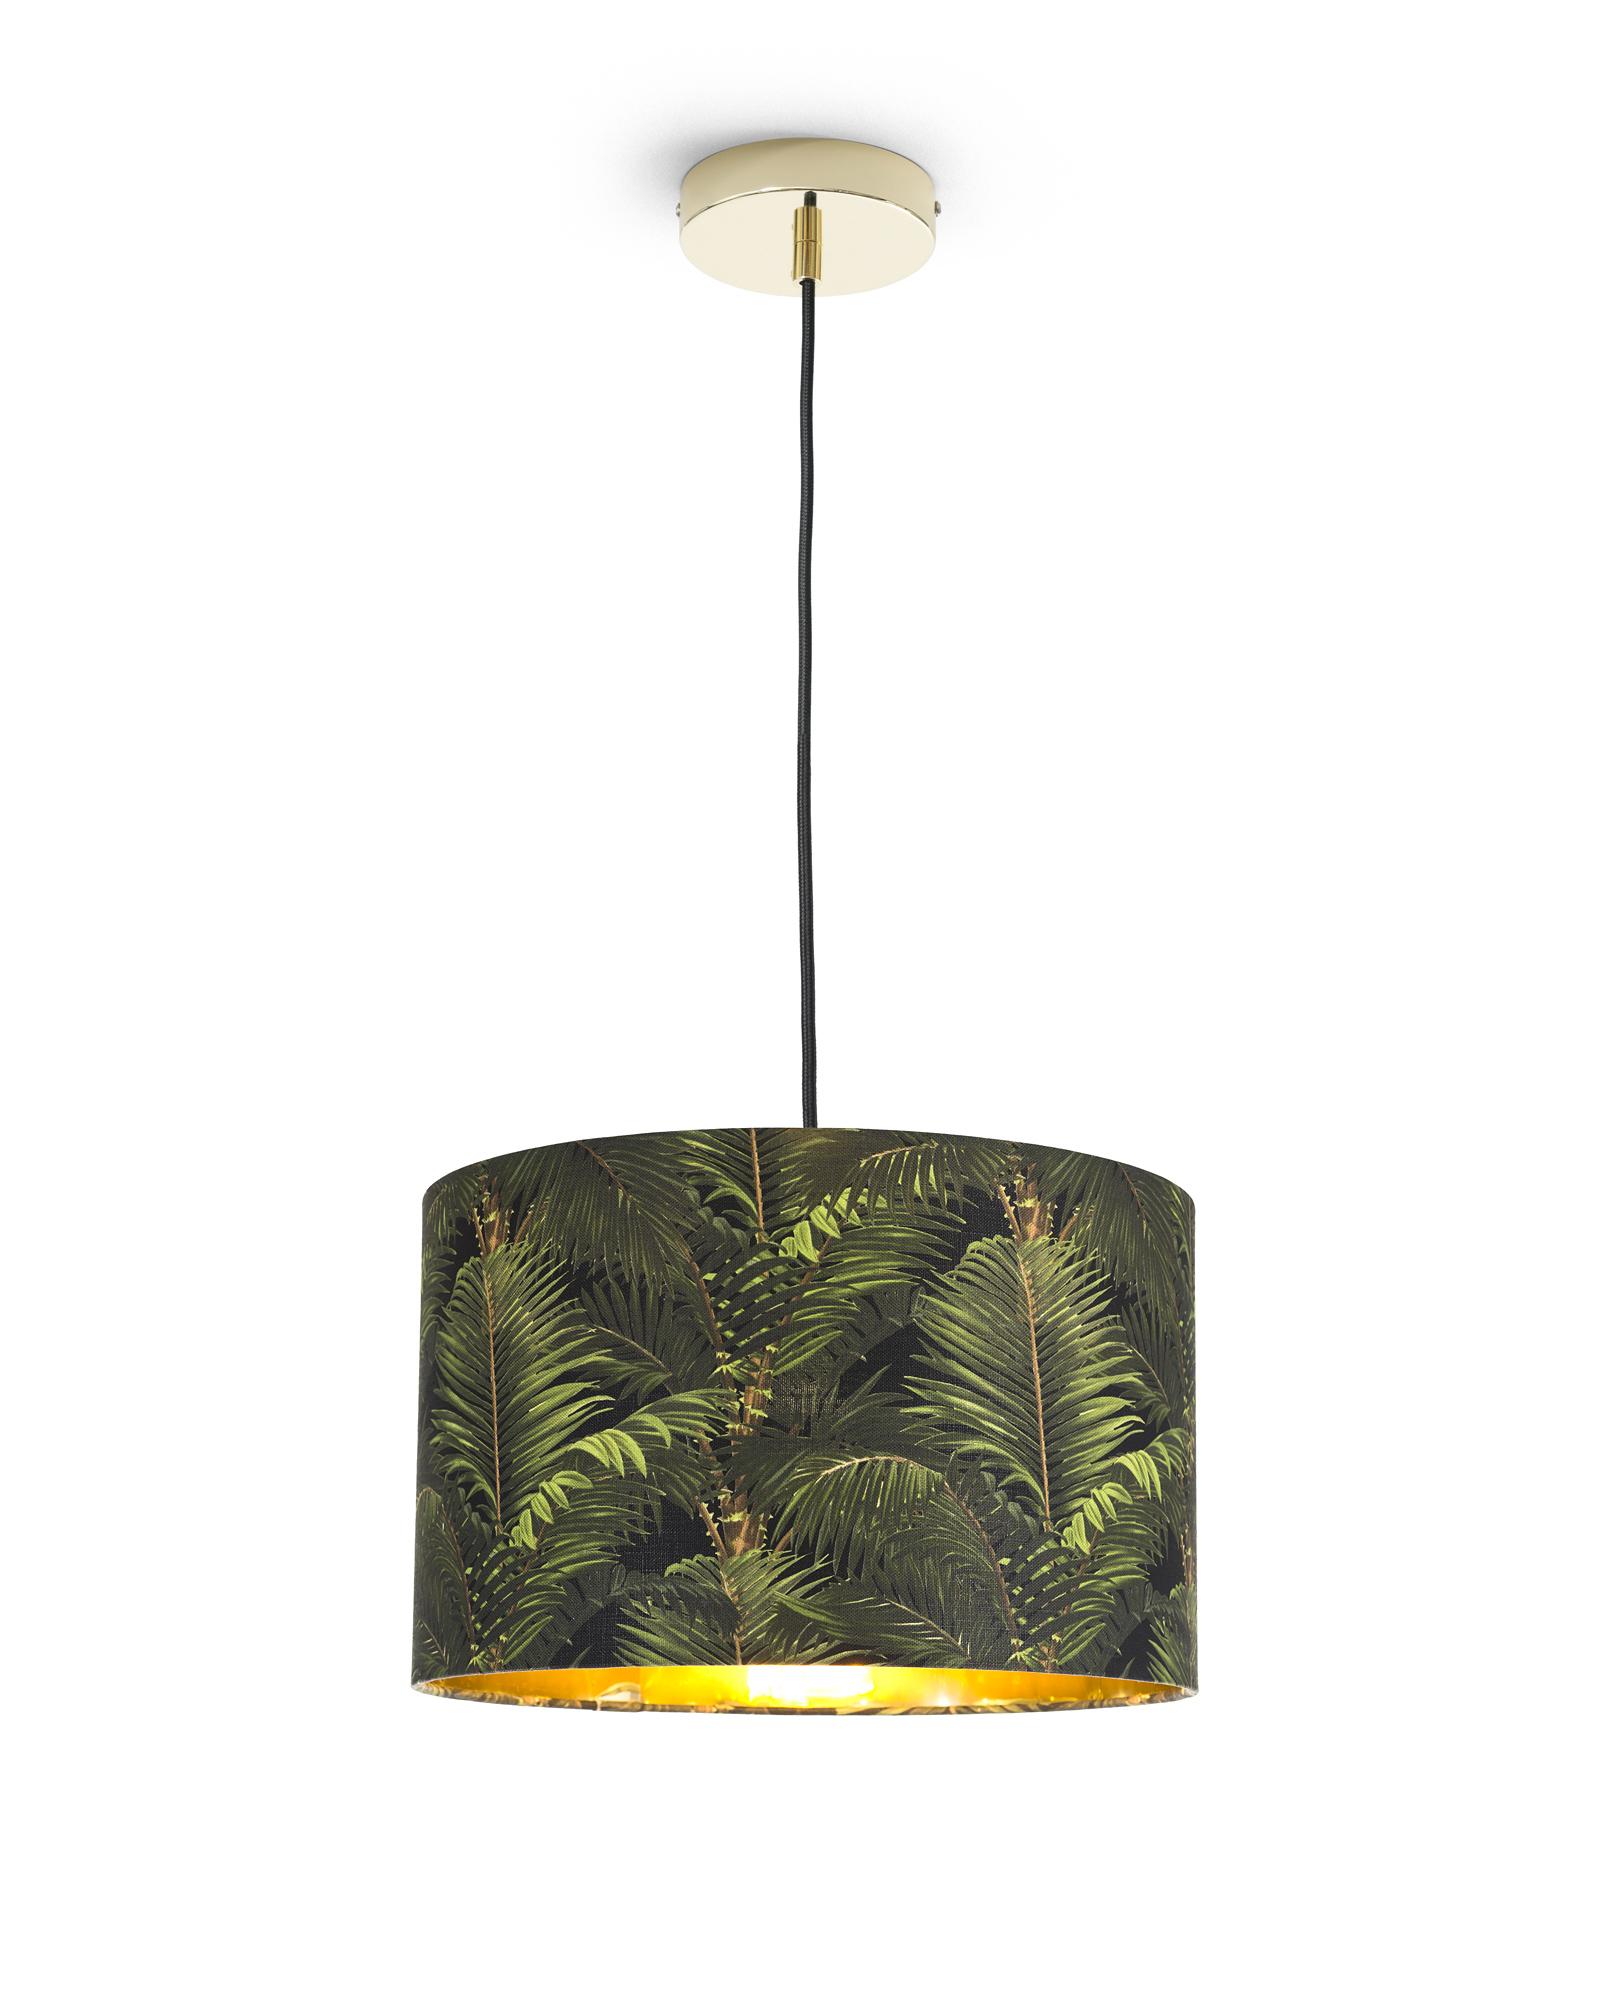 JARDIN TROPICAL Pendant Light 55cm x 30cm